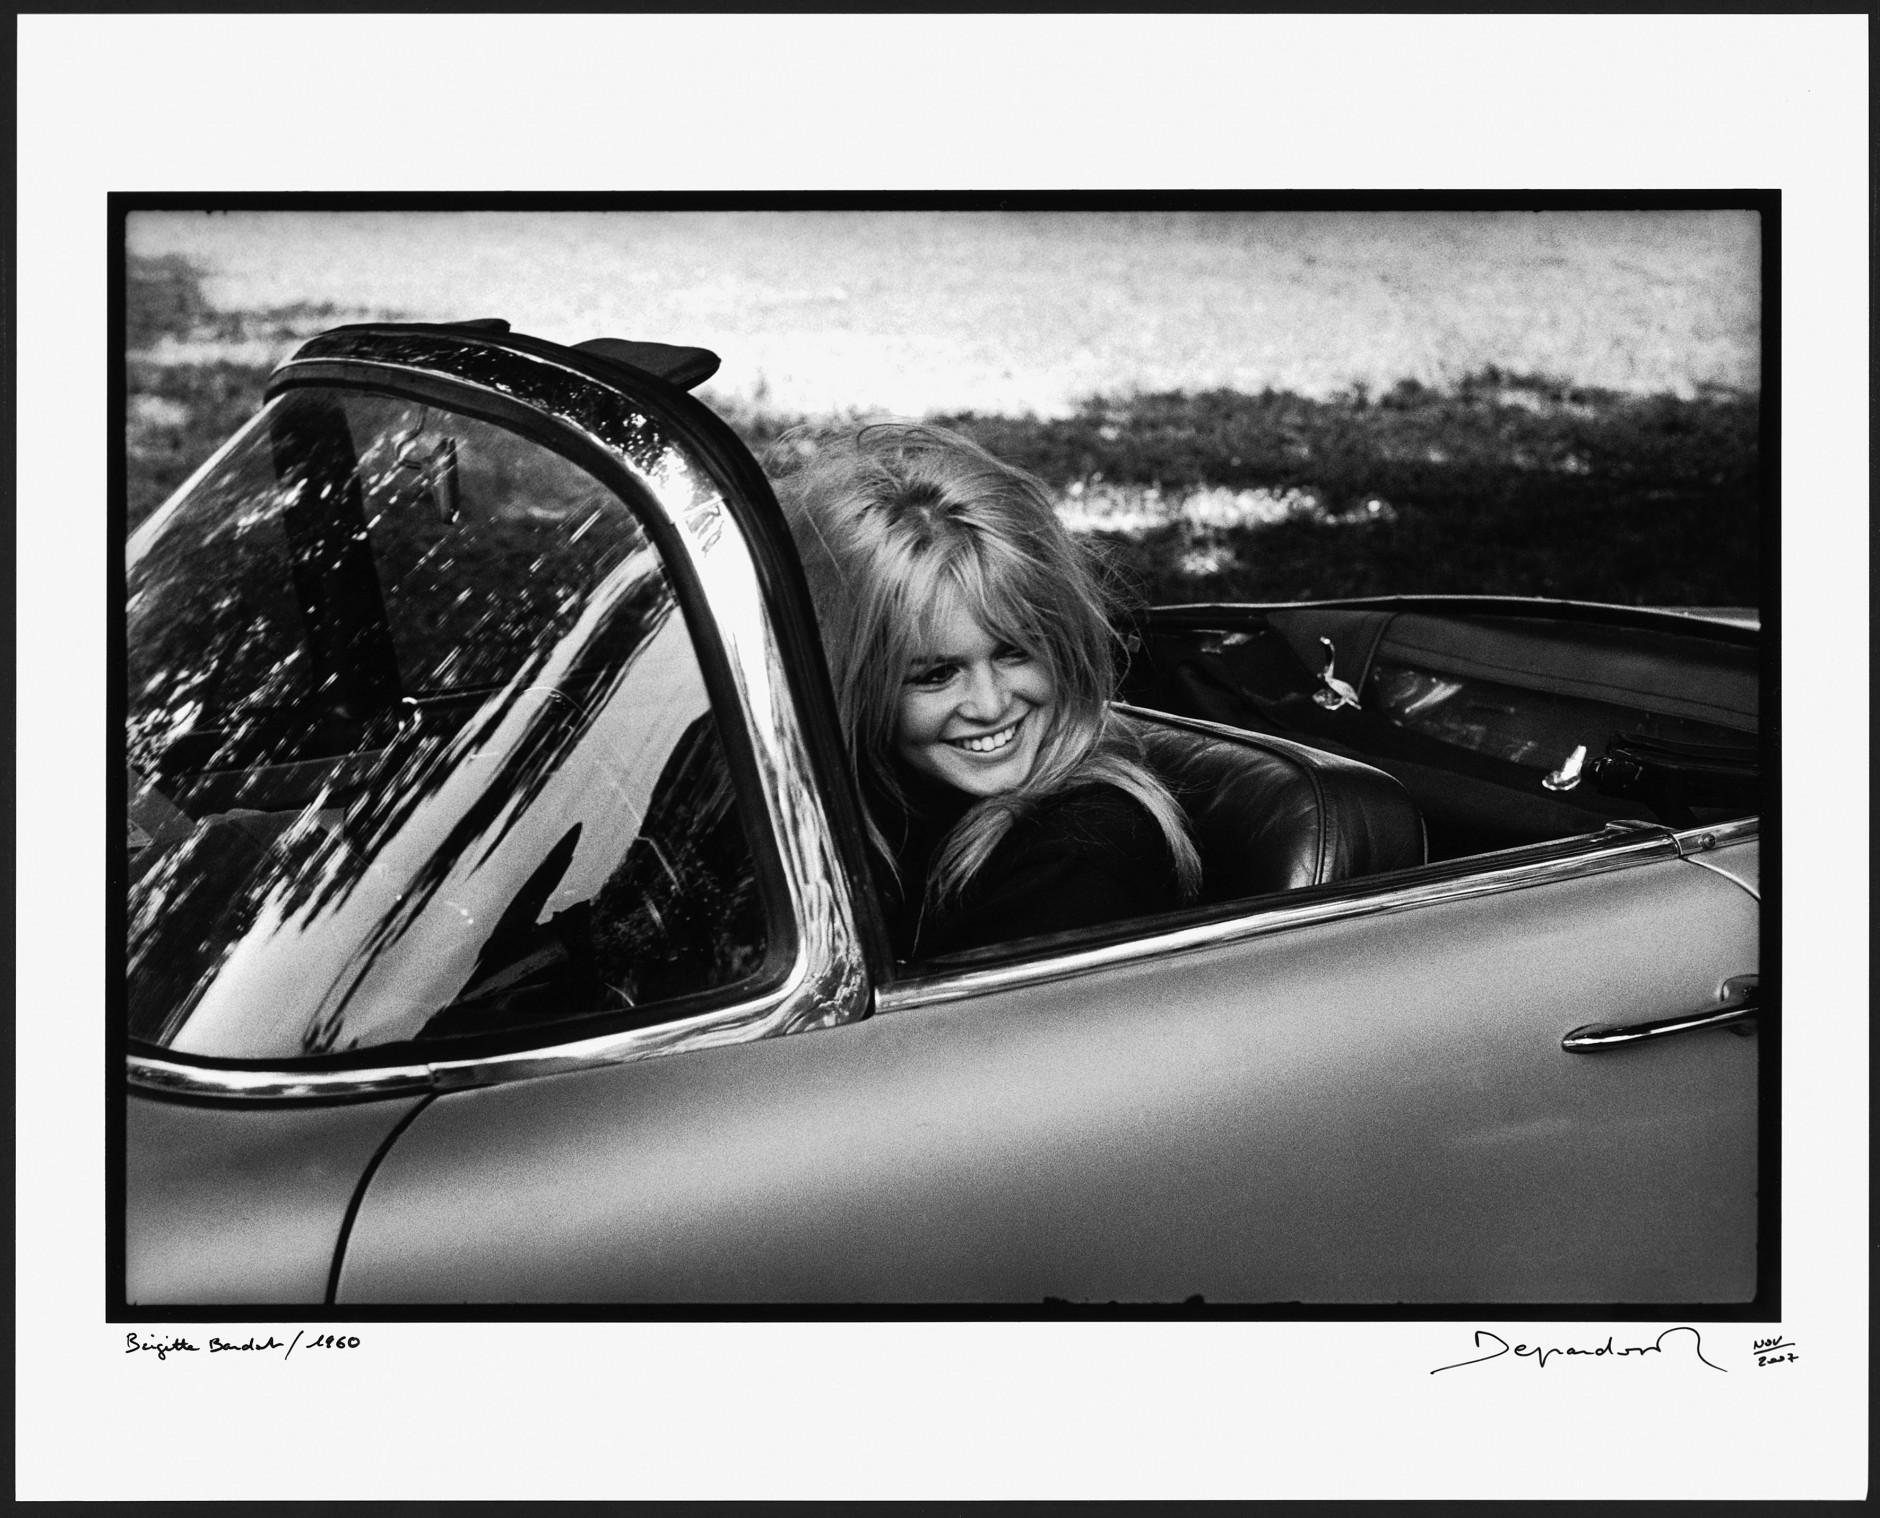 Raymond Depardon: Brigitte Bardot, 1960. © Raymond Depardon/Magnum Photos